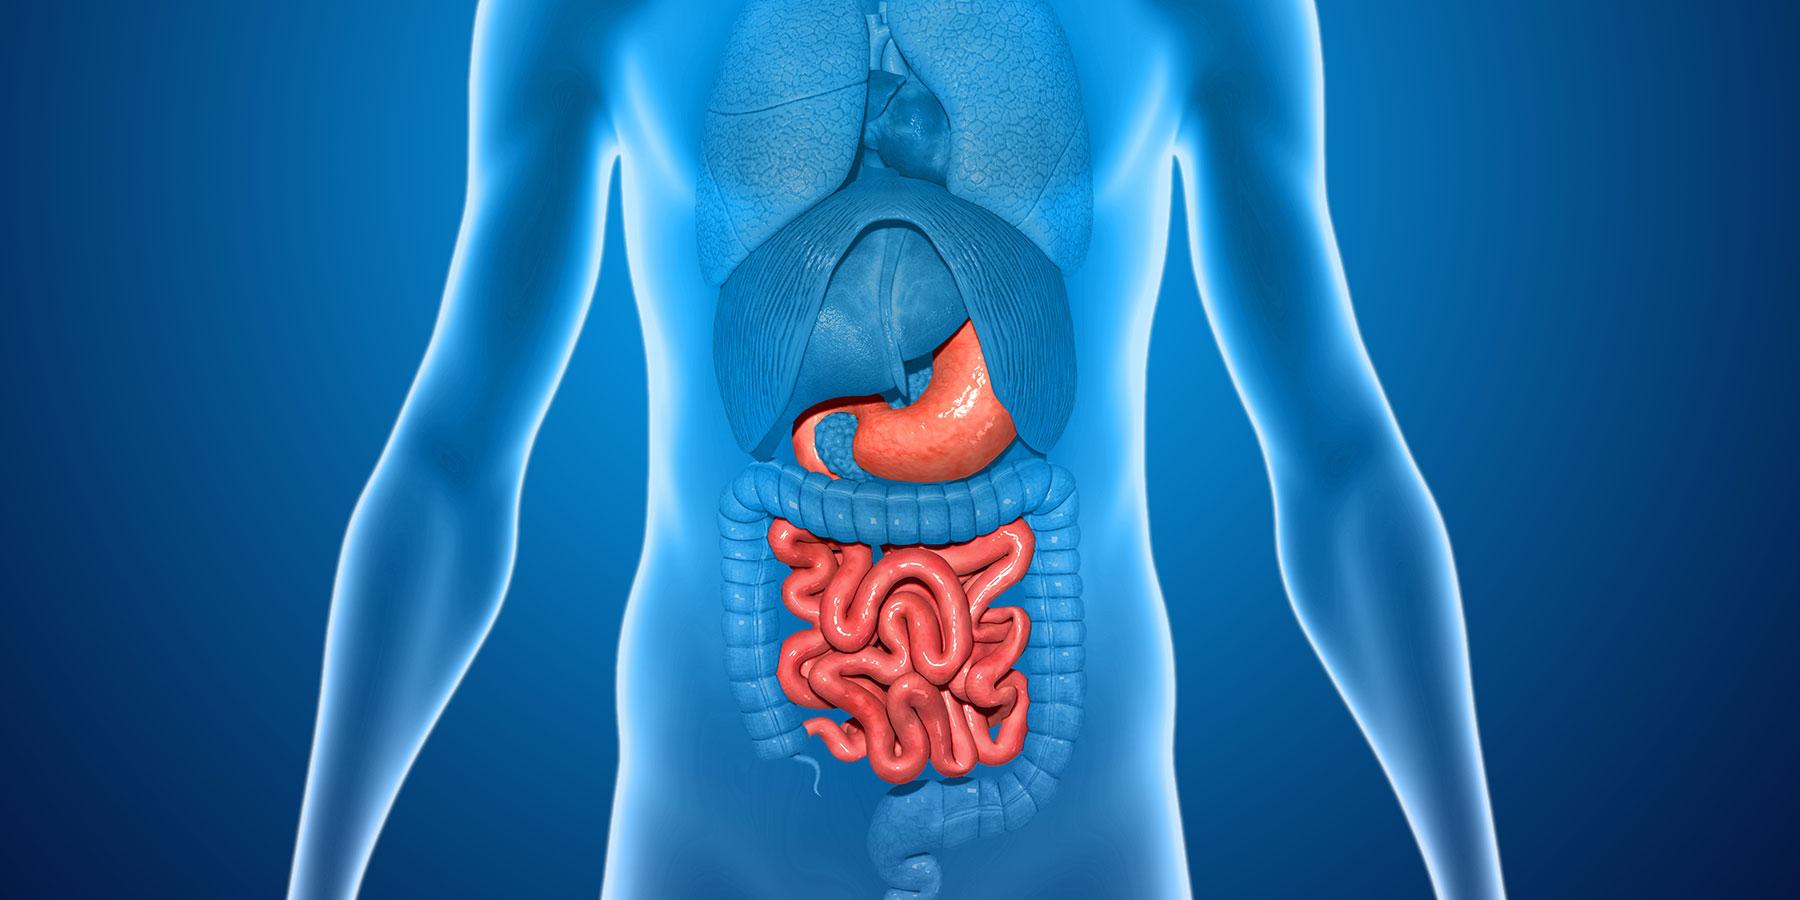 Revealing genetic and cellular mechanisms of Crohn's disease